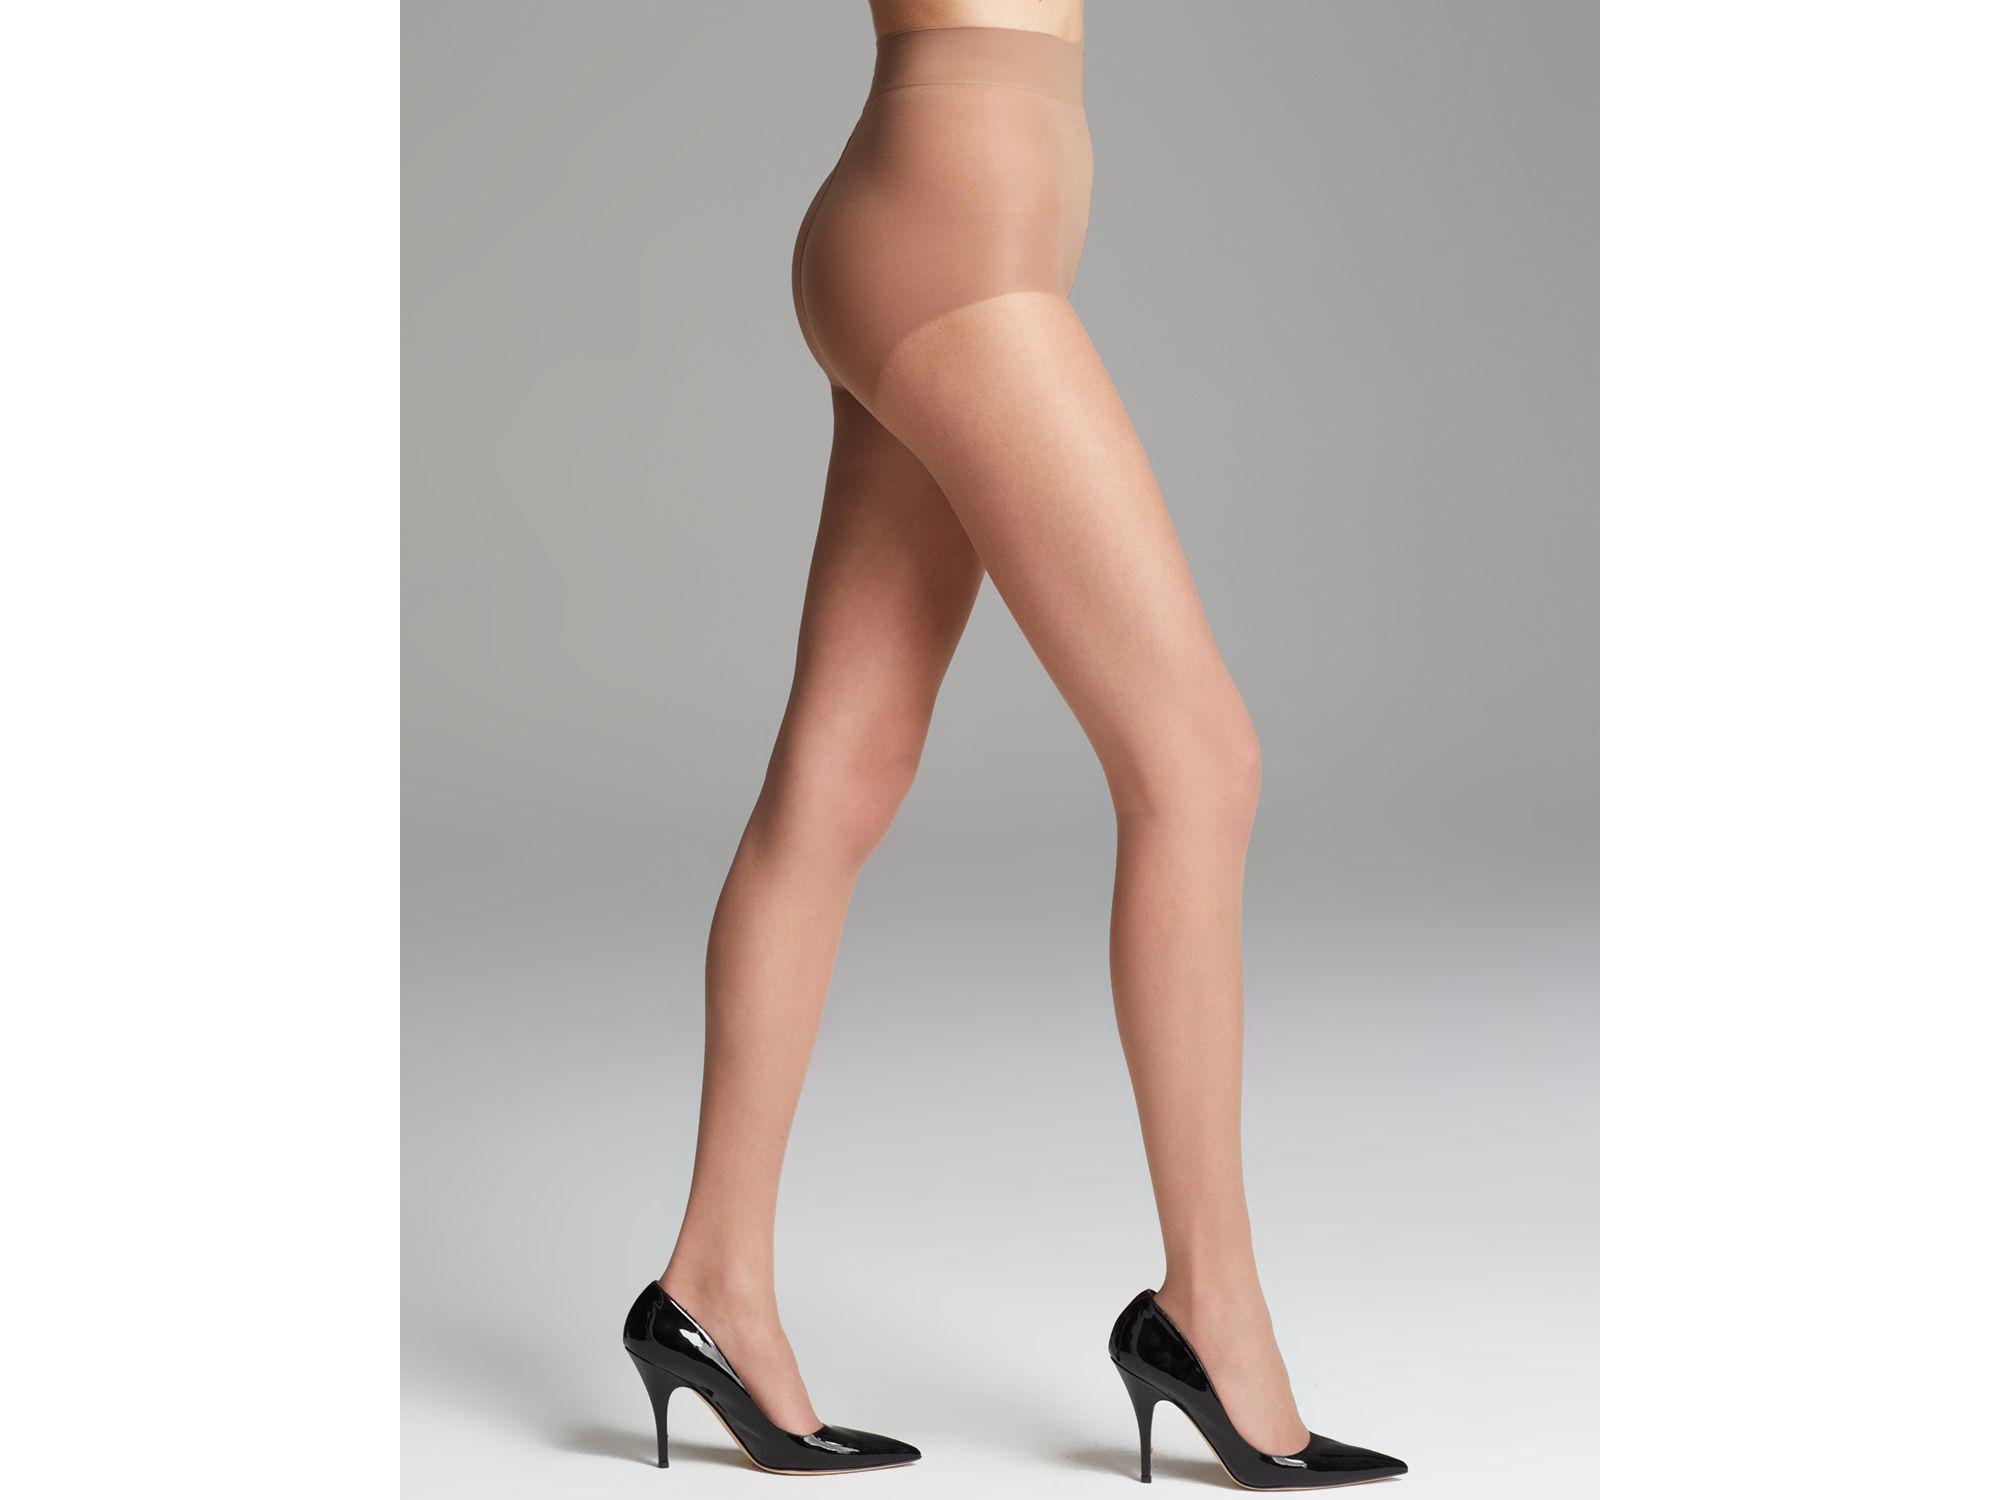 Great spanking porn video online